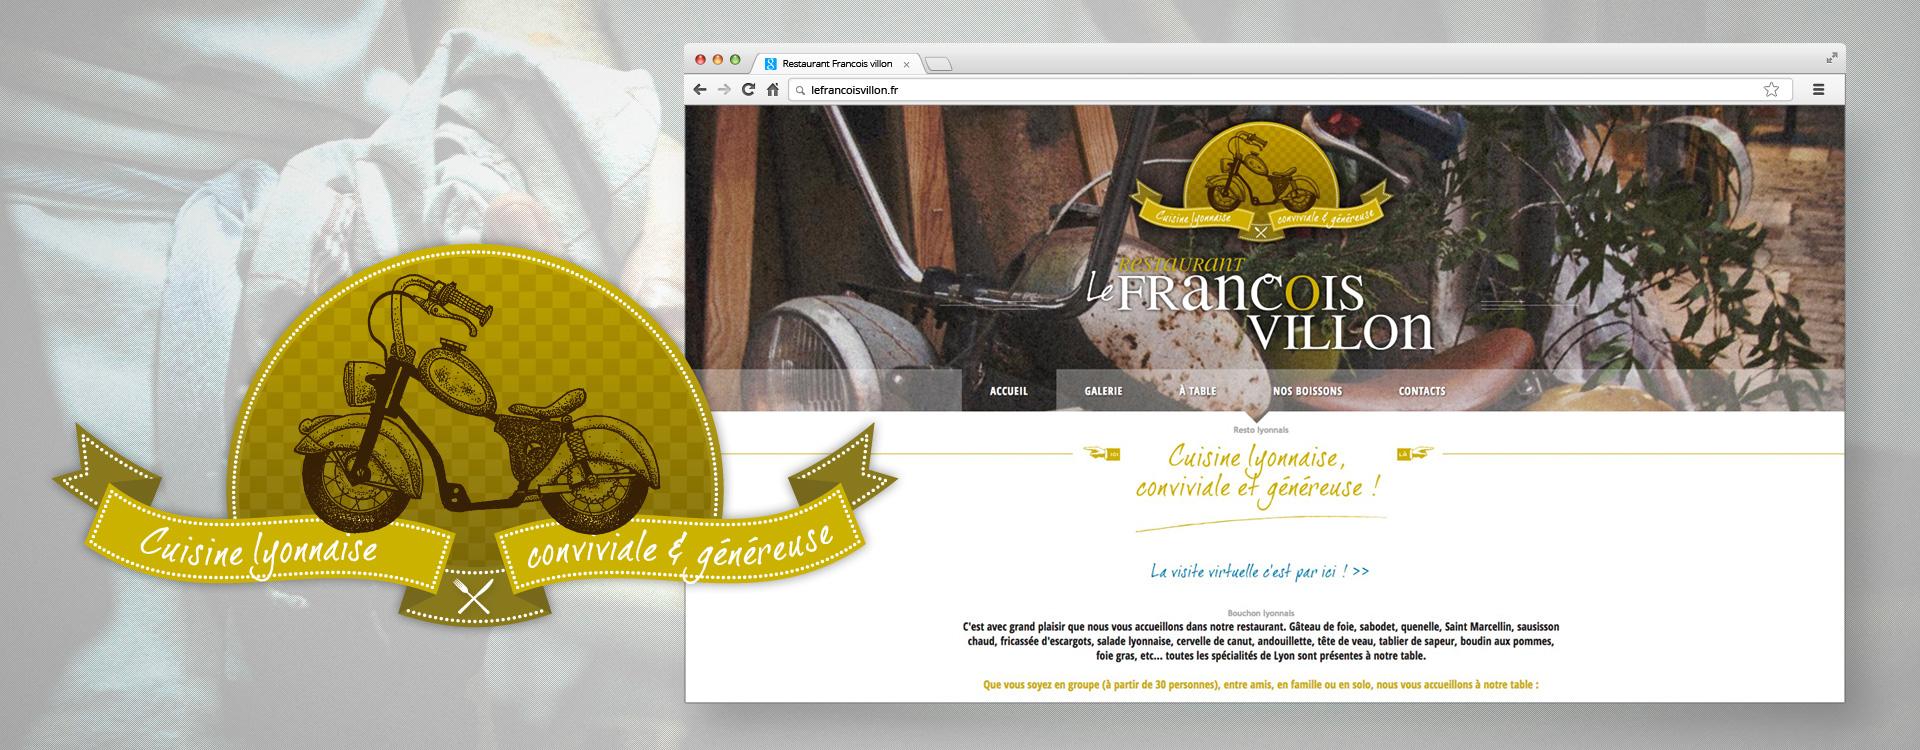 francois-villon-1